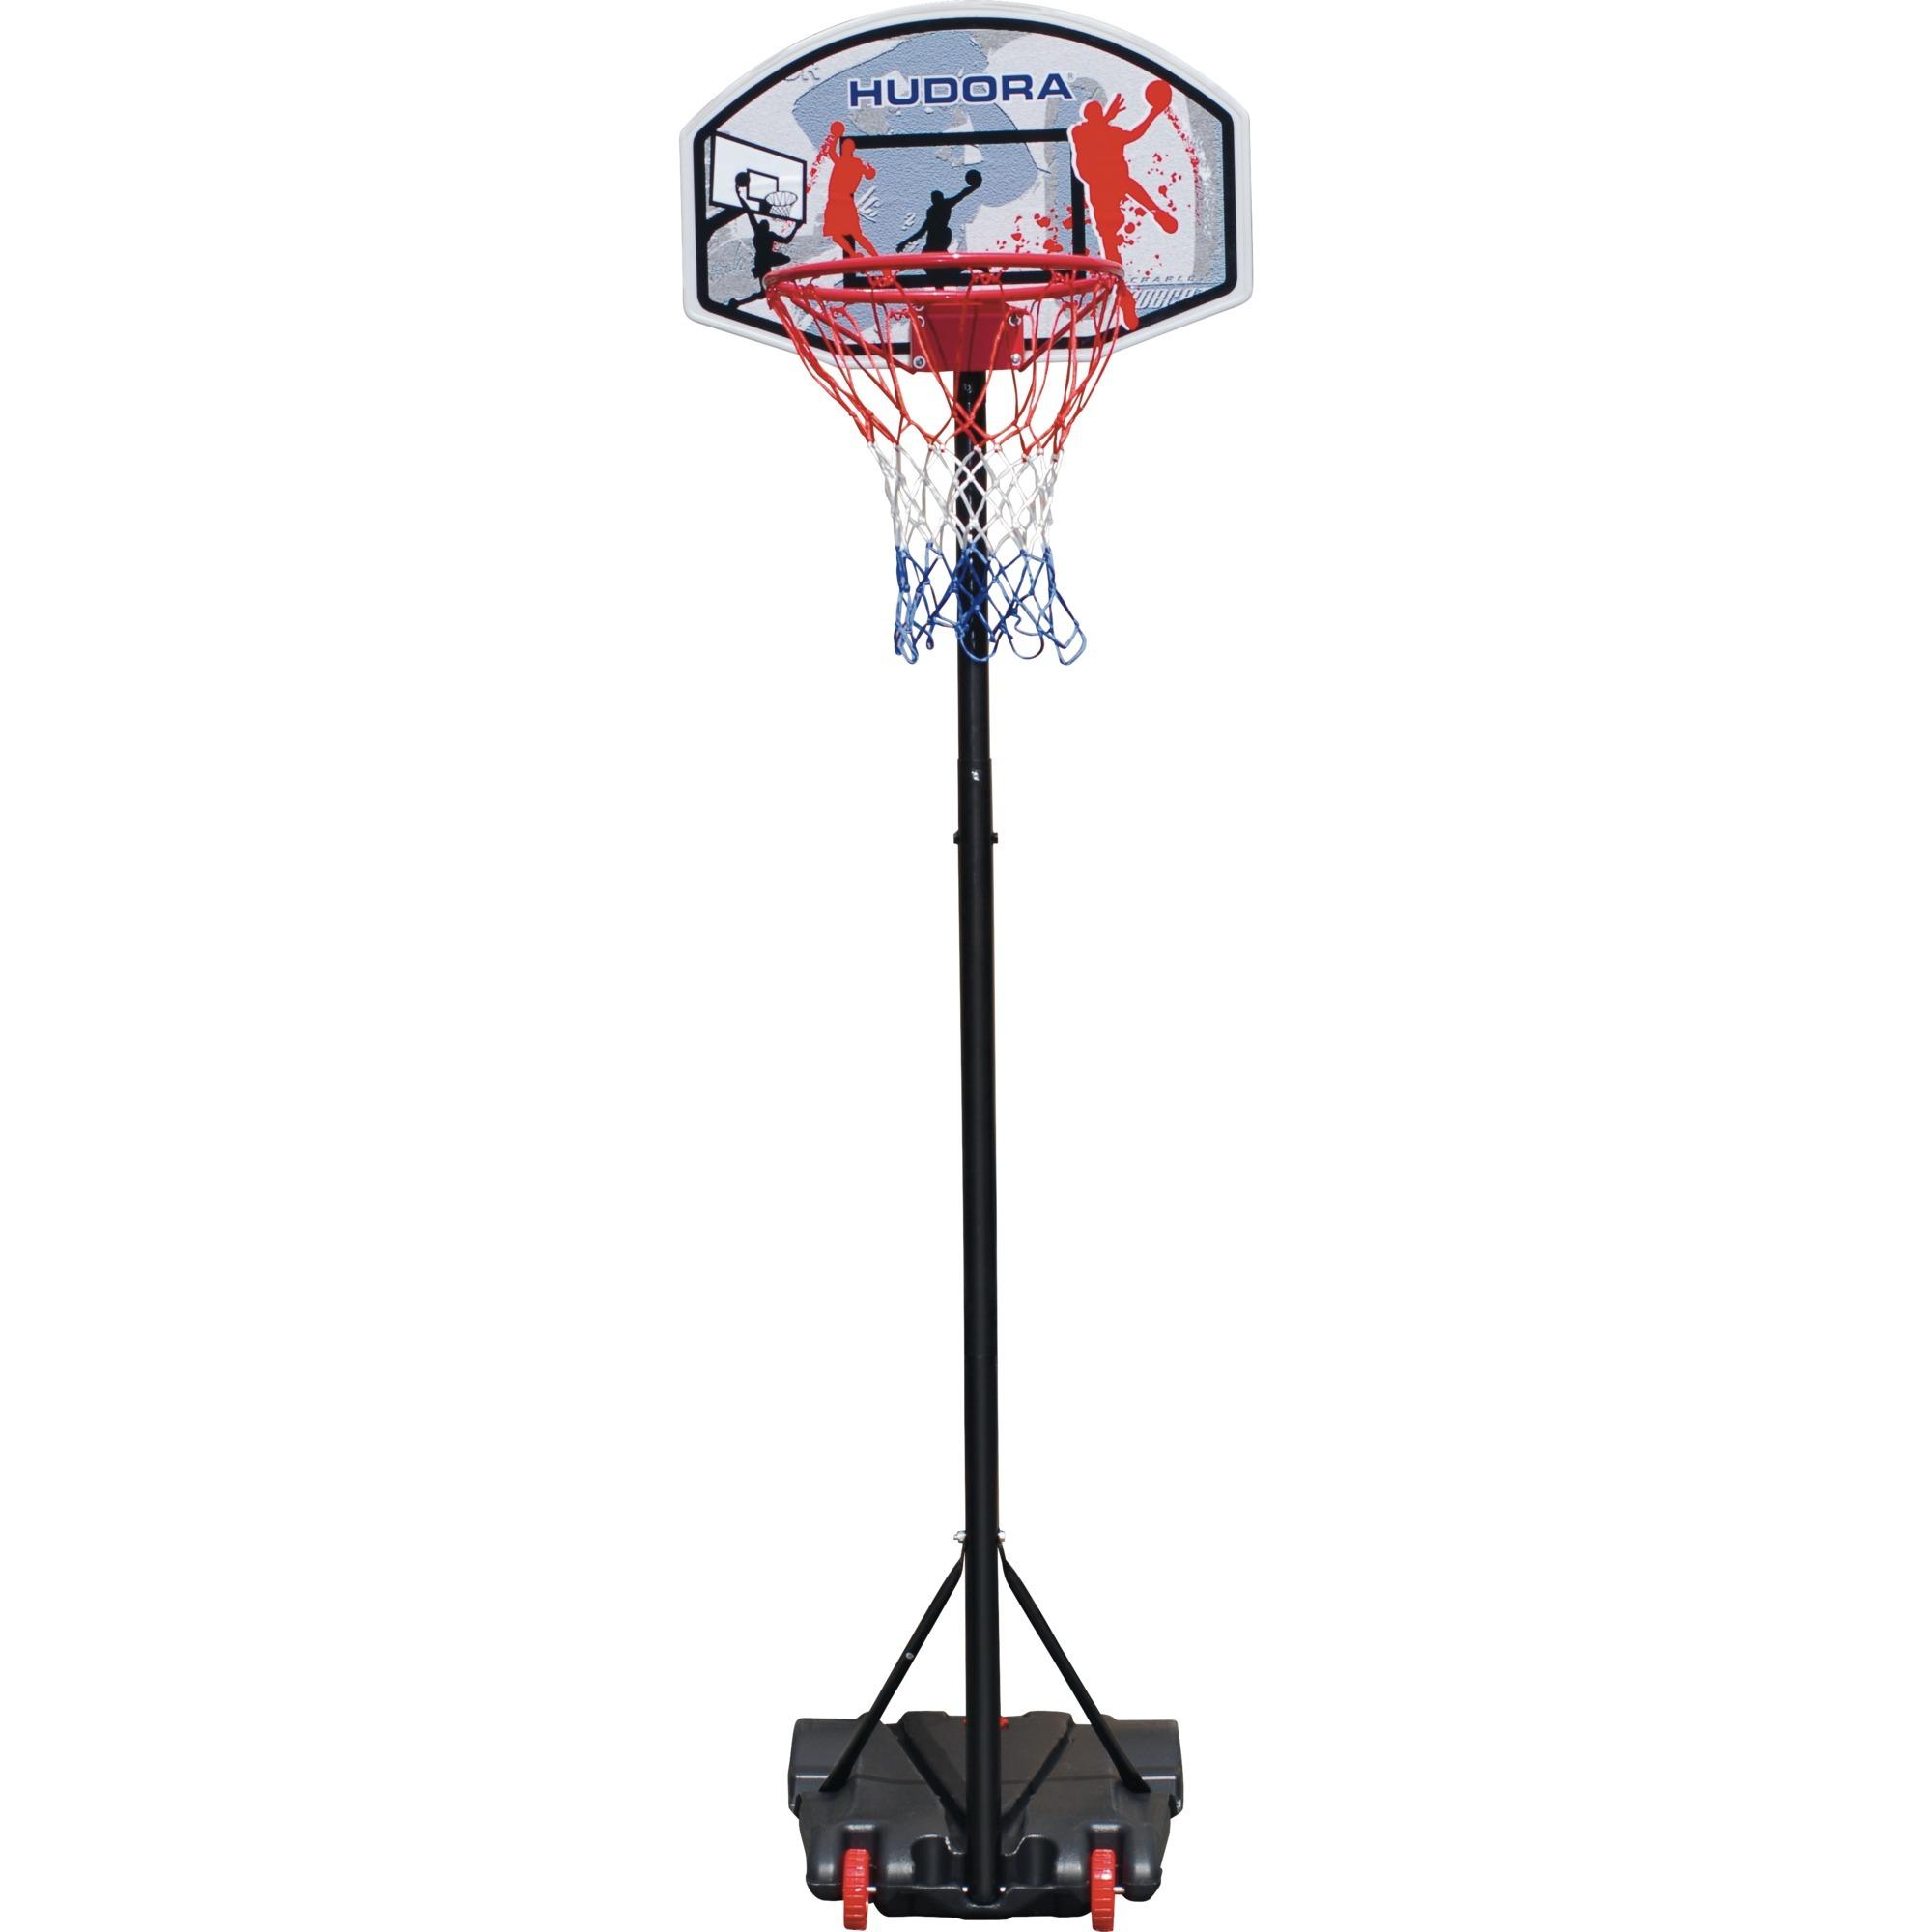 Dvd St Nder hudora all 71655 canestro da pallacanestro basket 60 89